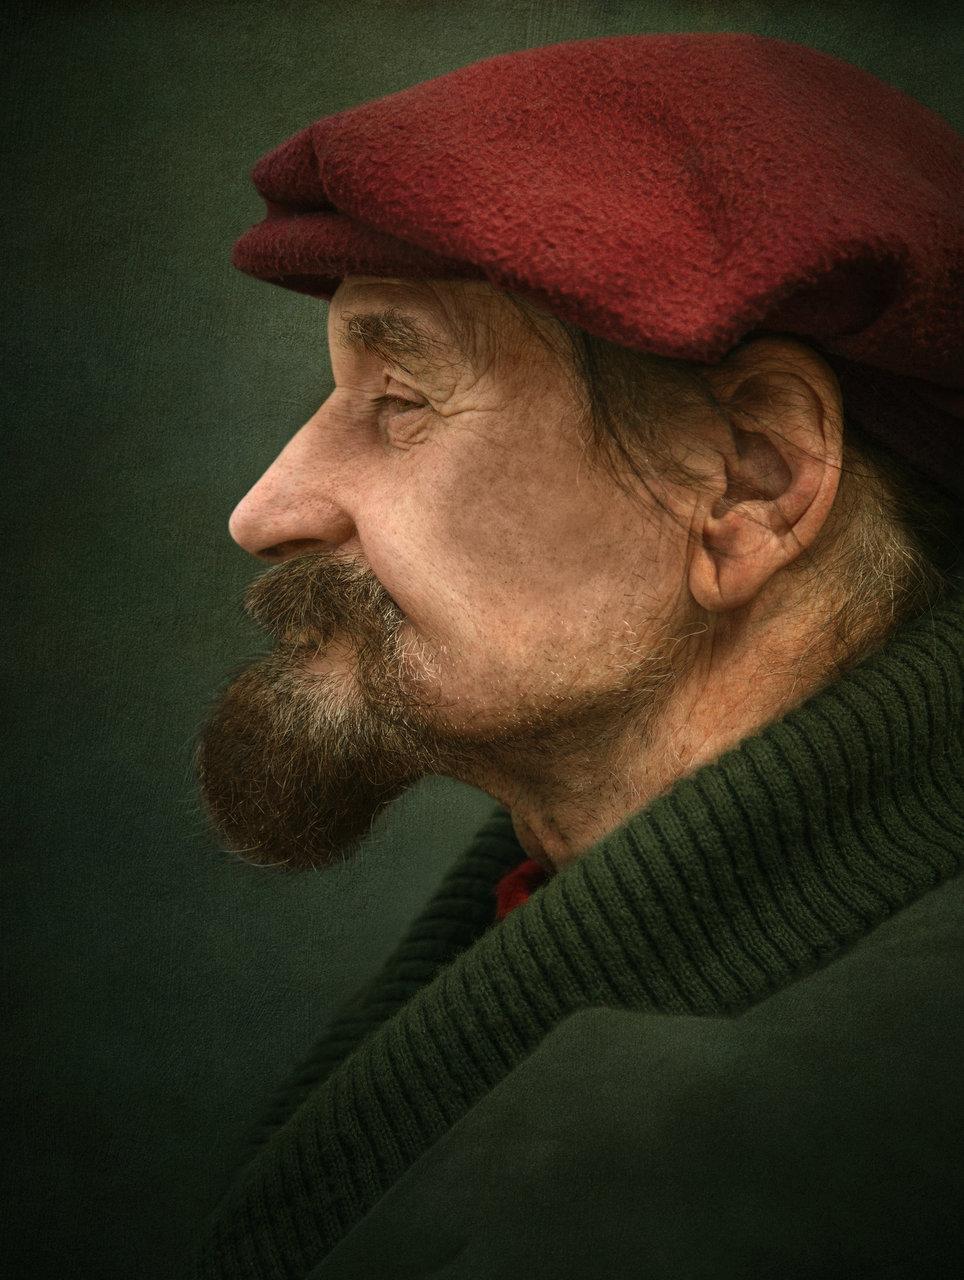 Photo in Portrait | Author artniko | PHOTO FORUM